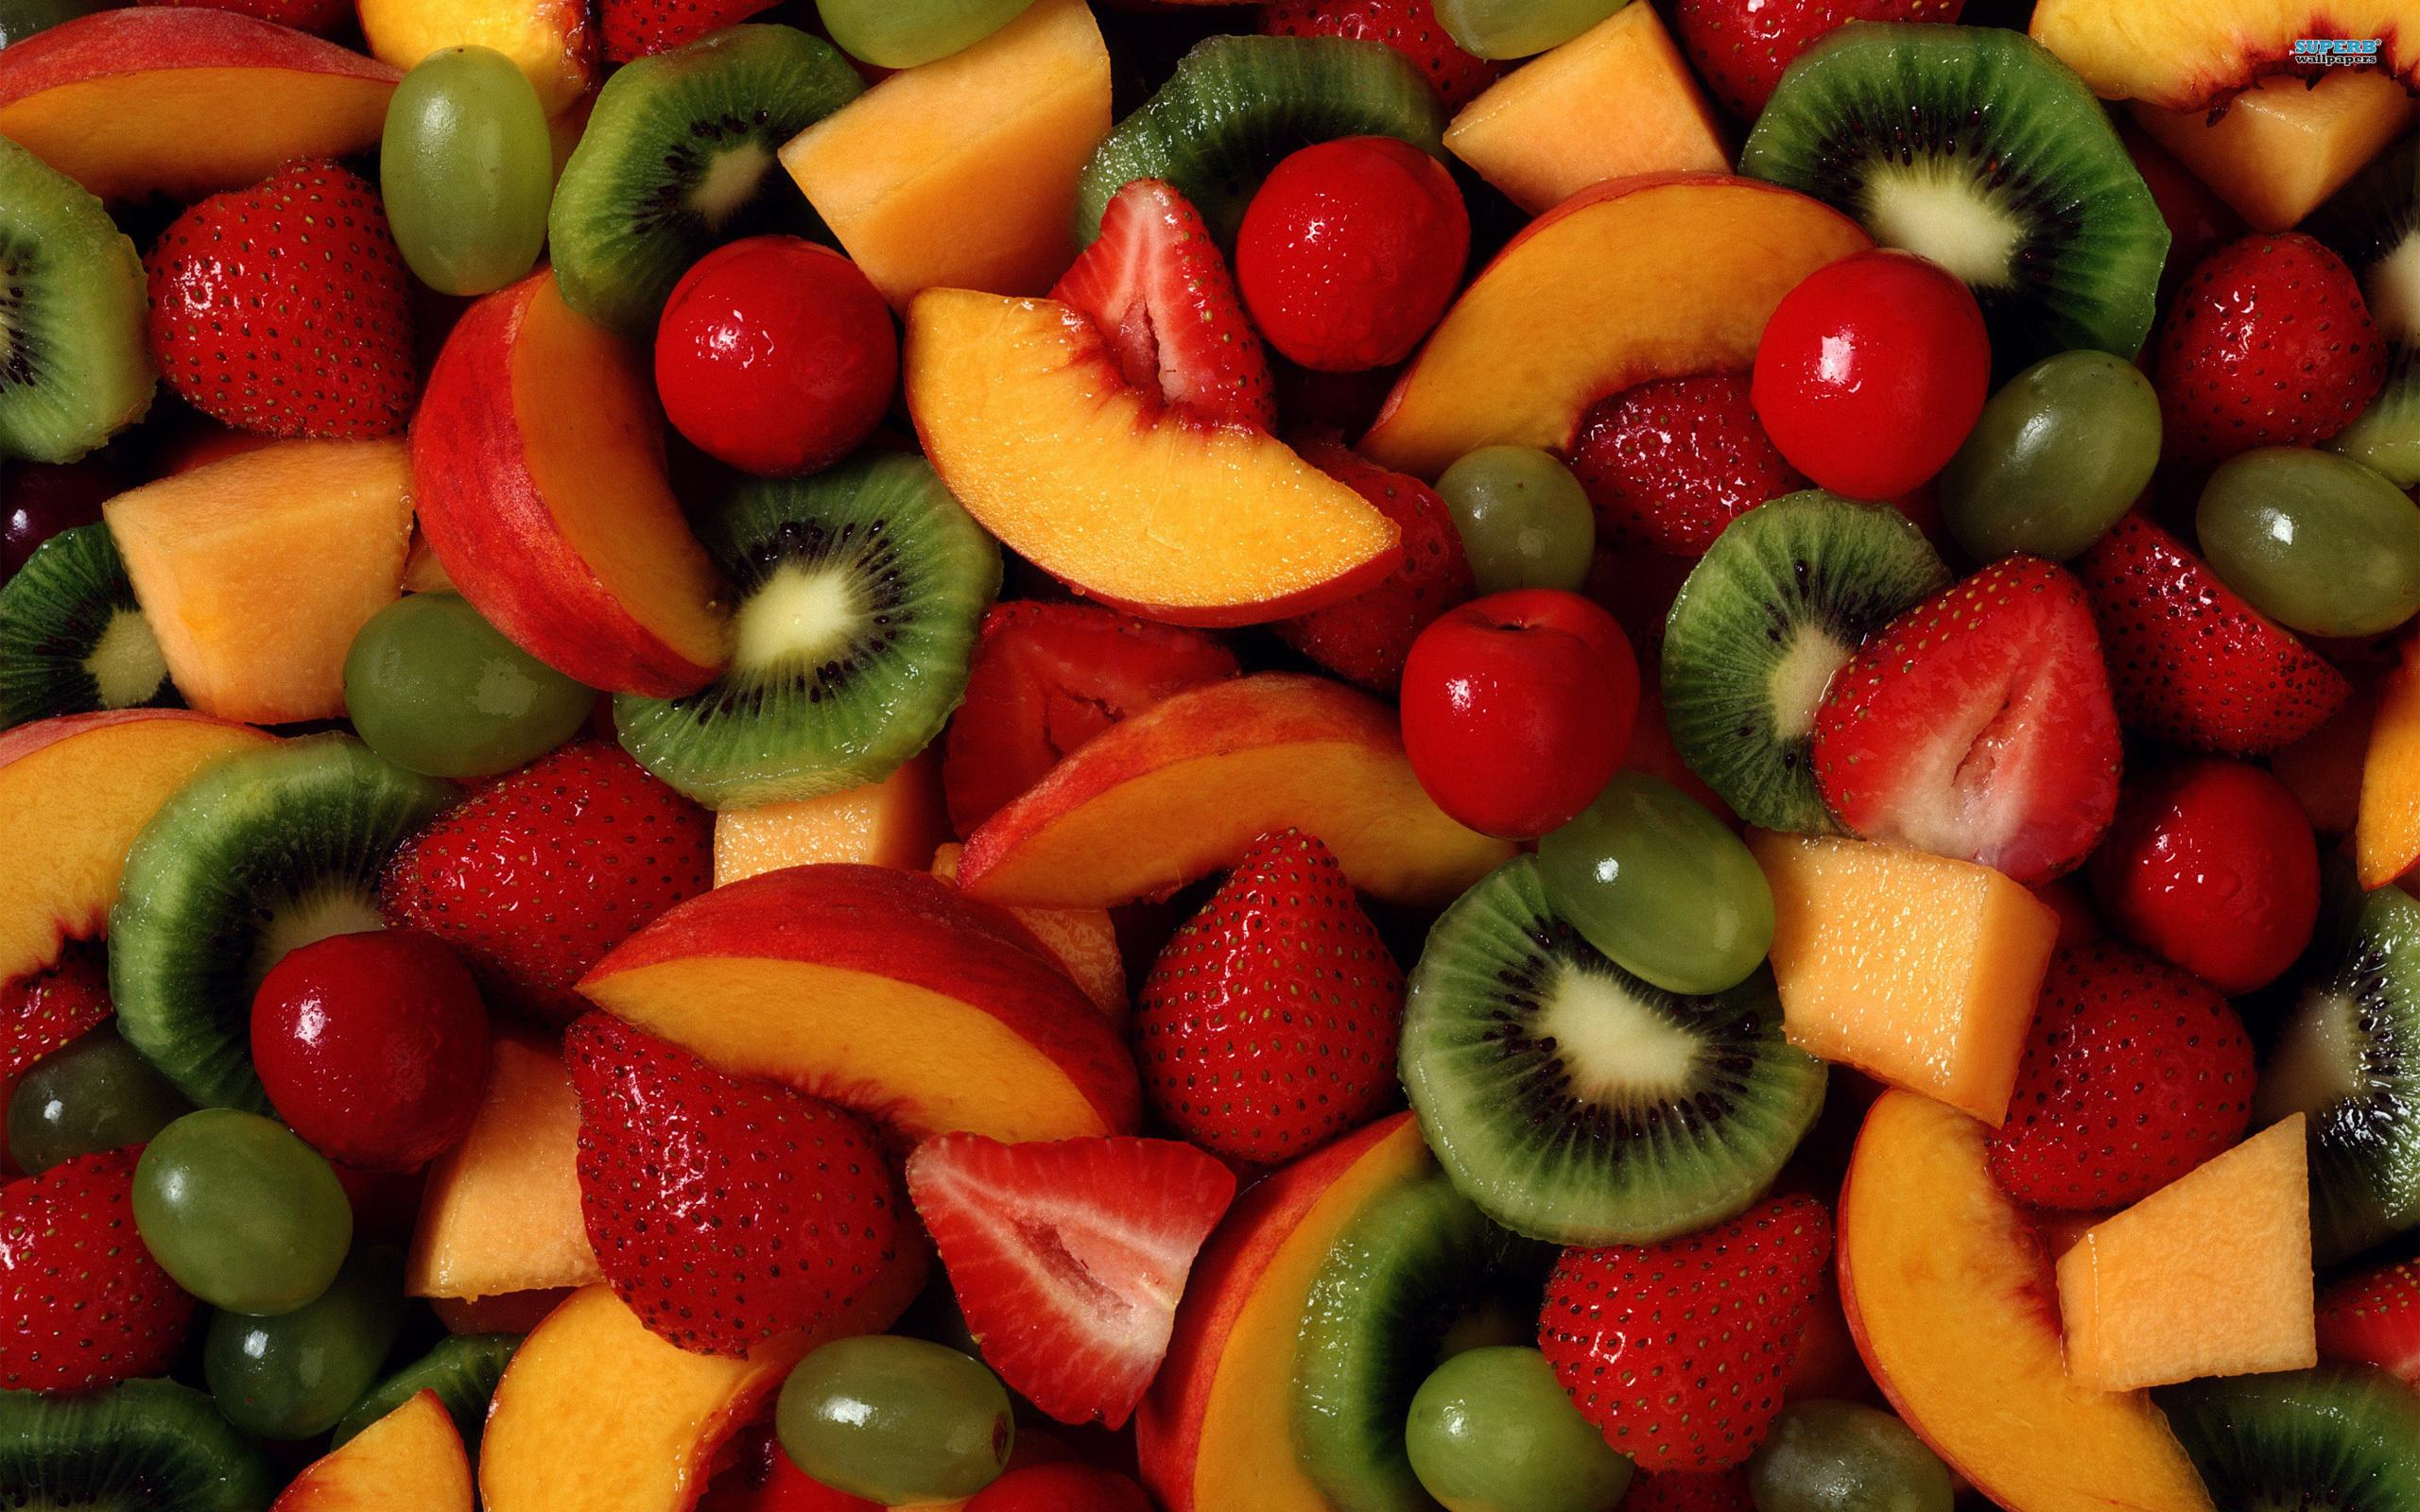 régime frugivore